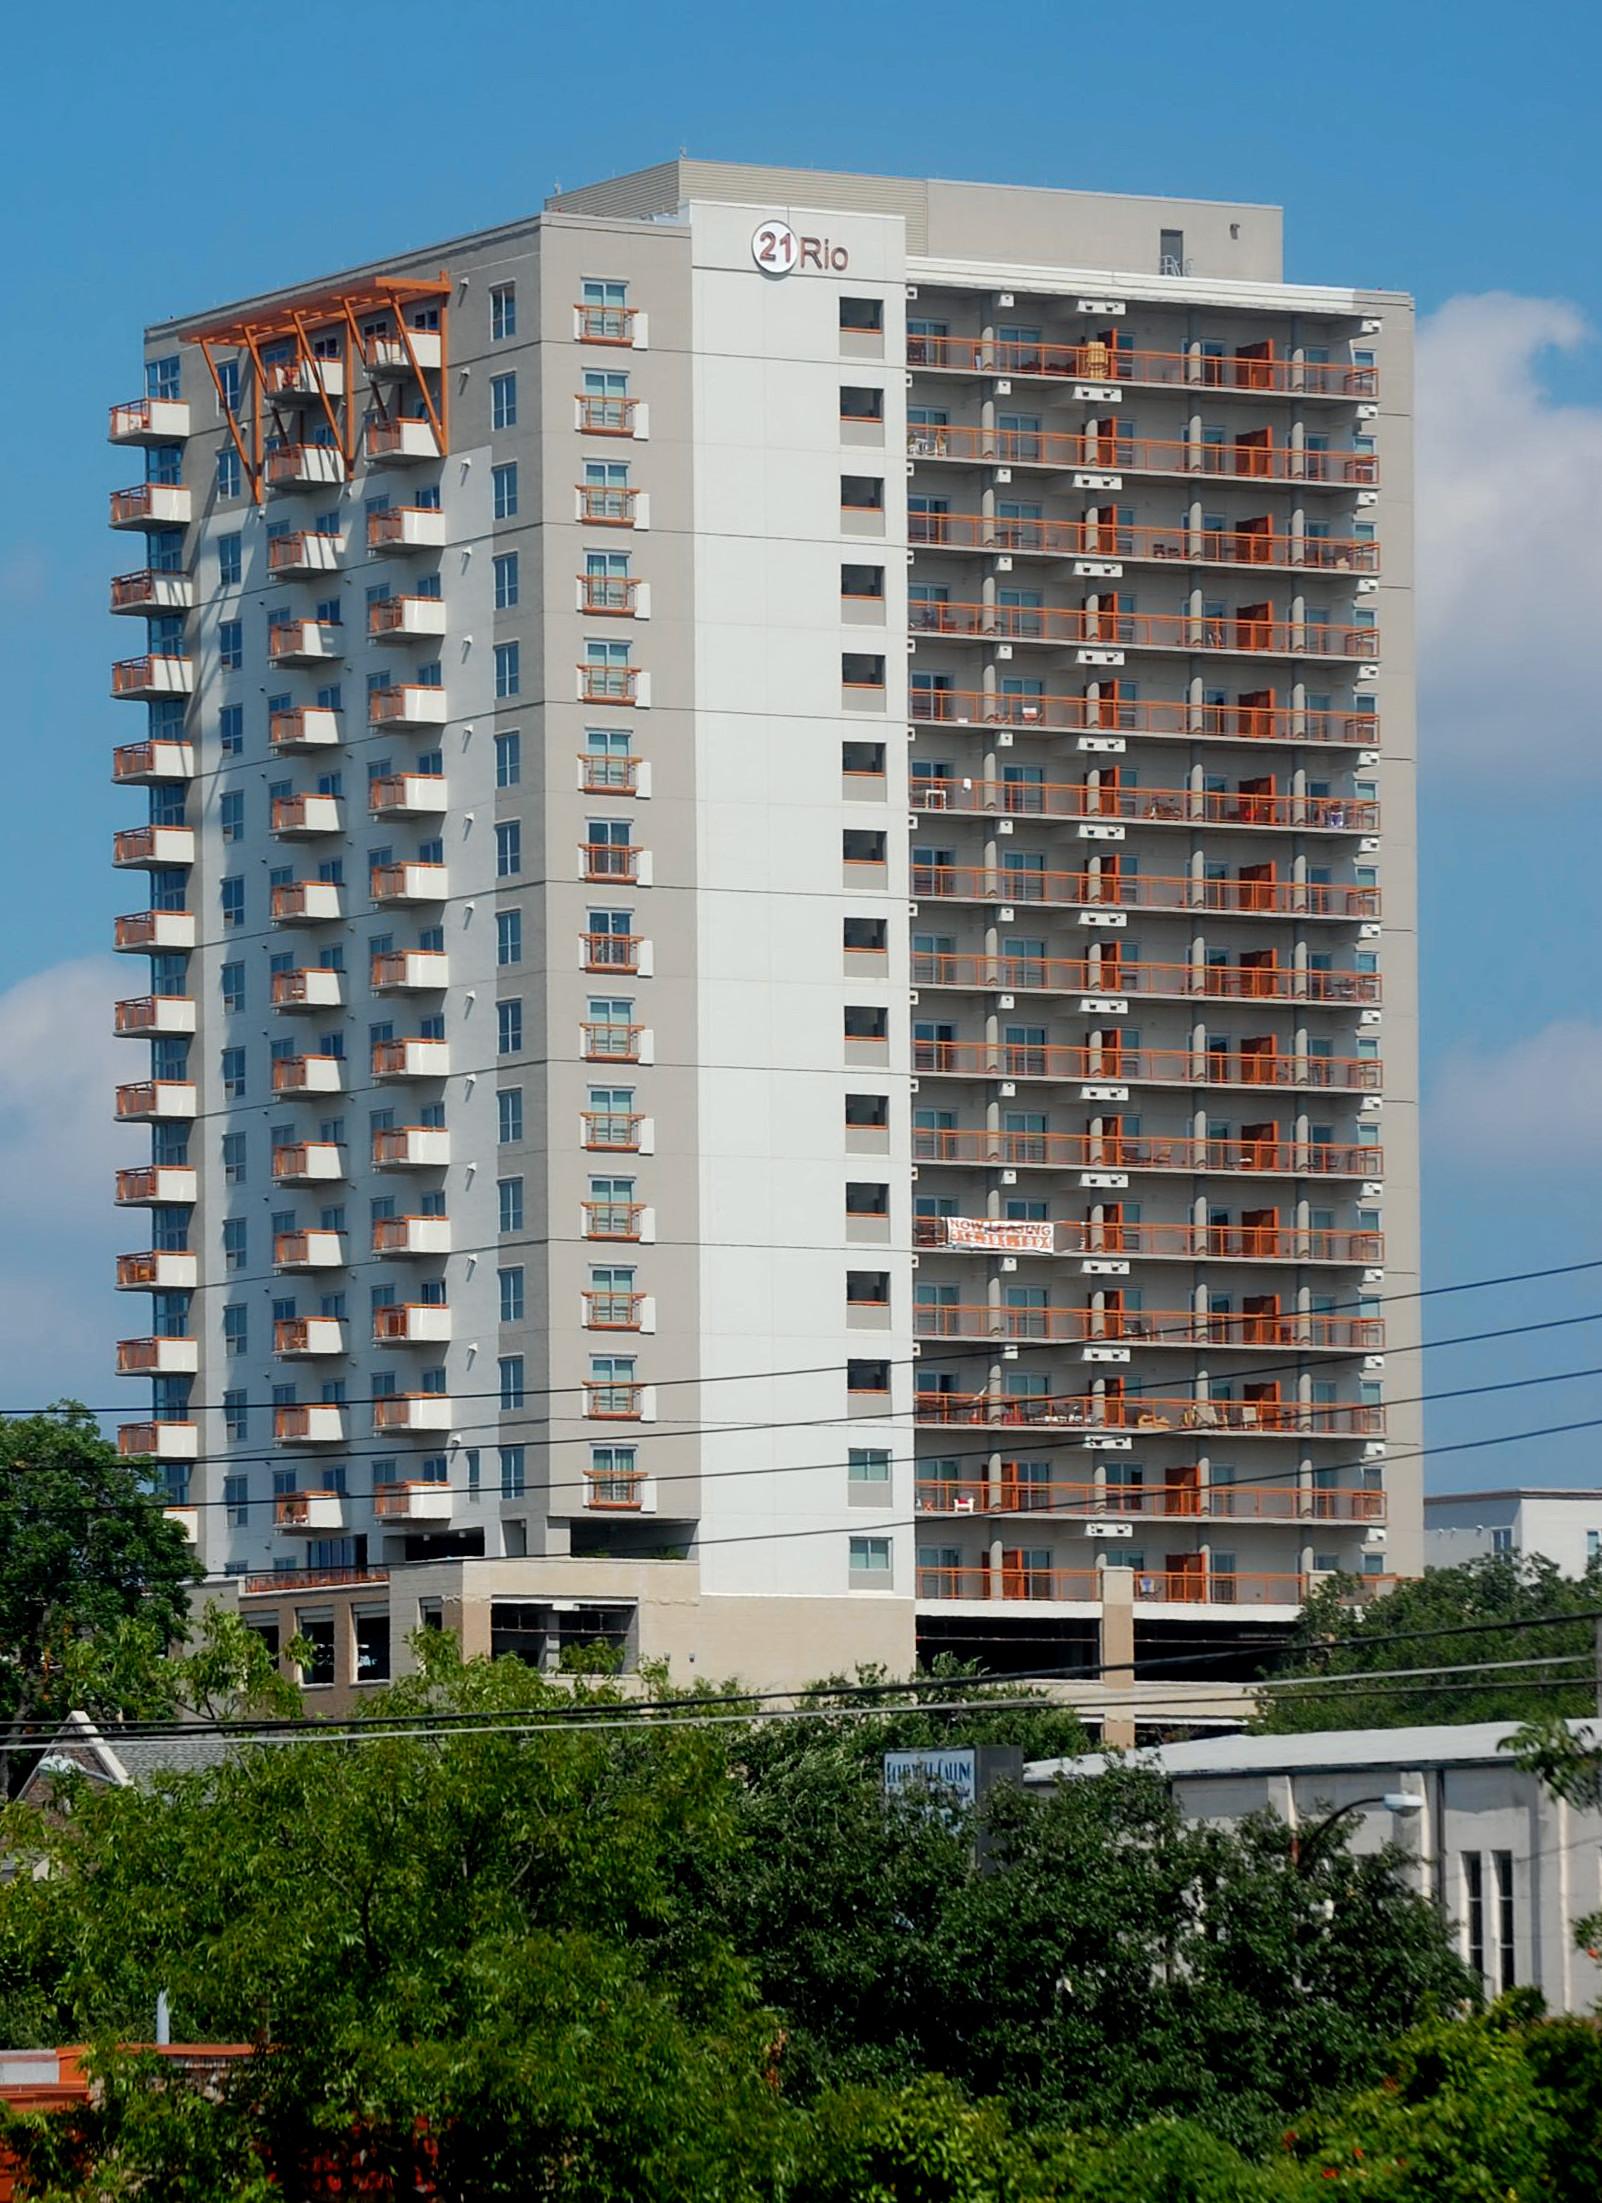 Rio Apartments Austin Tx